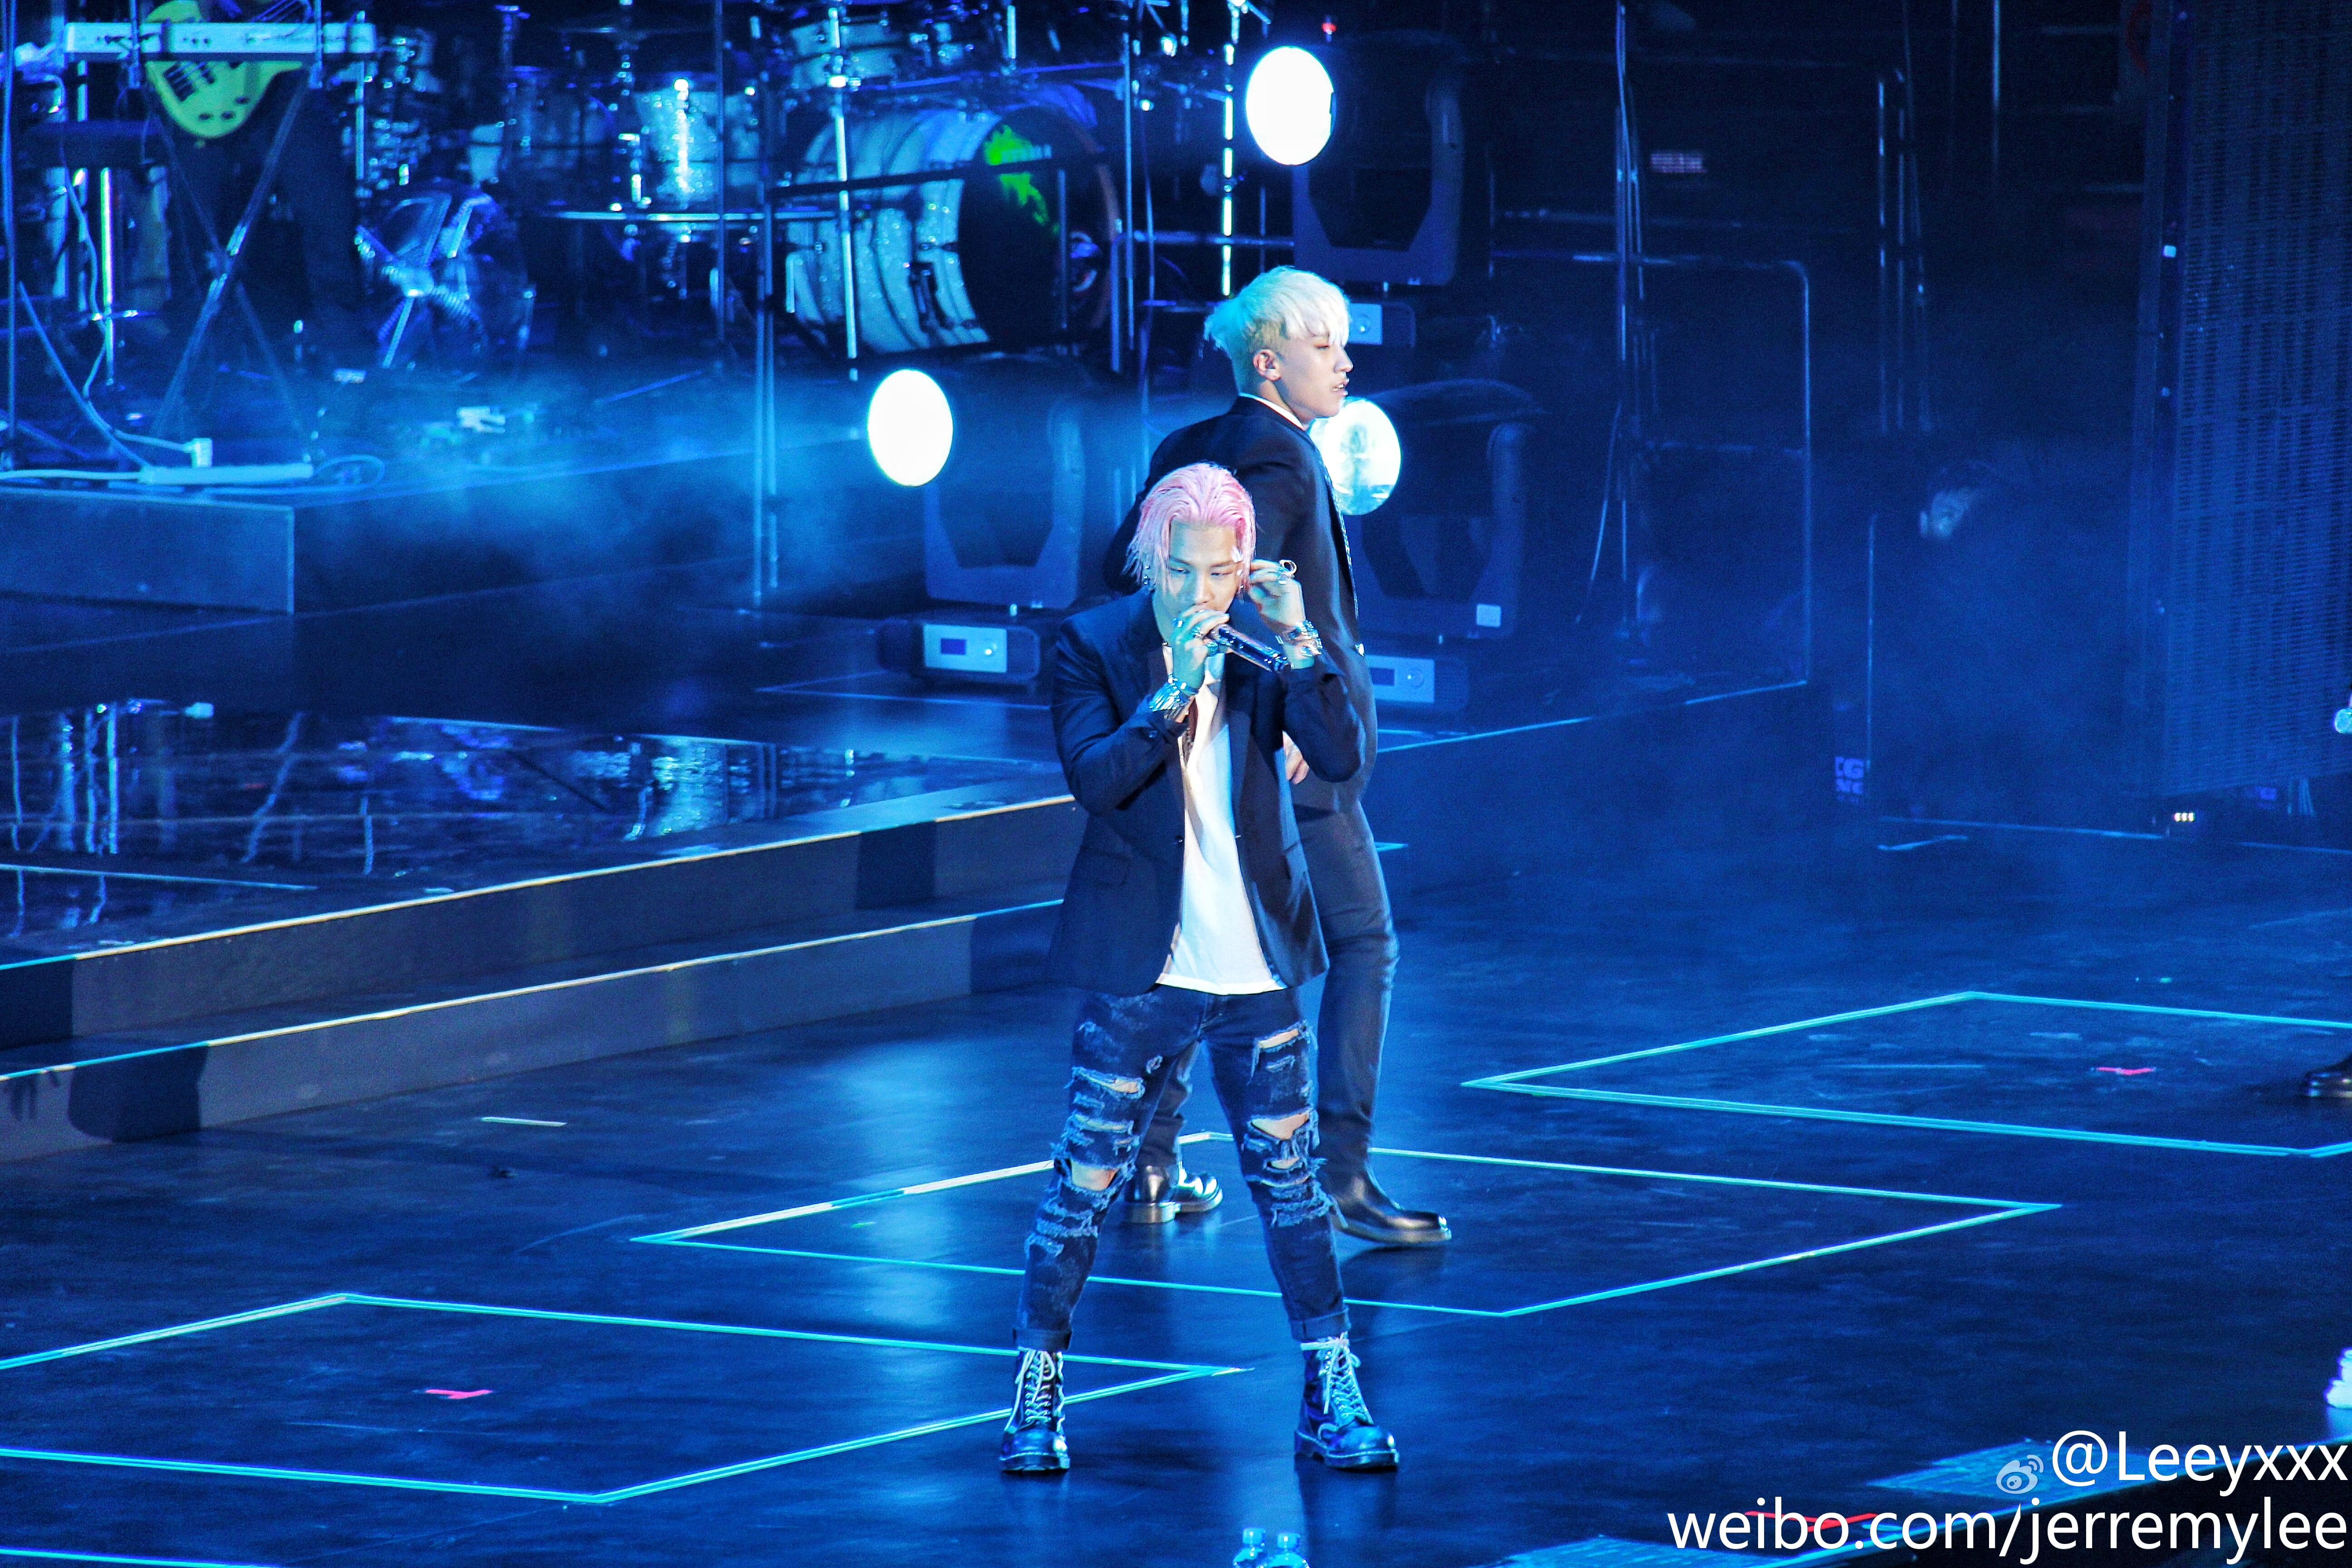 BIGBANG - Made Tour 2015 - Guangzhou - 30may2015 - jerremylee - 01.jpg